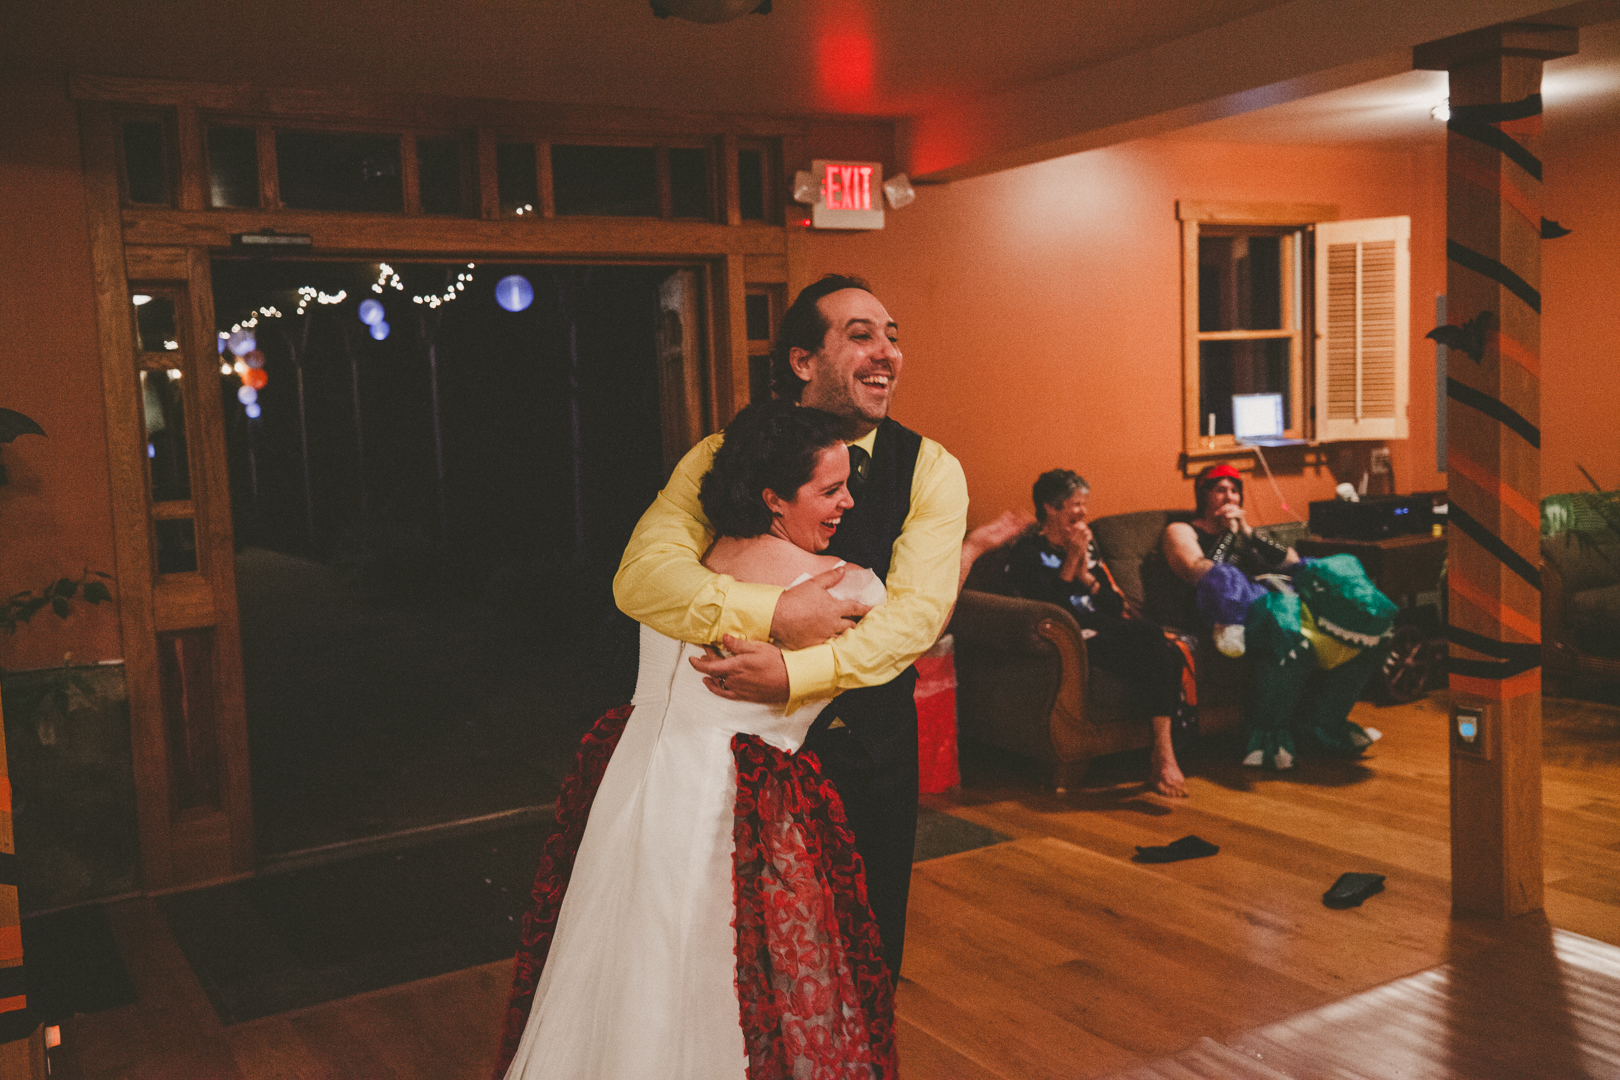 Mike&Hannah_HalloweenWedding-42.jpg